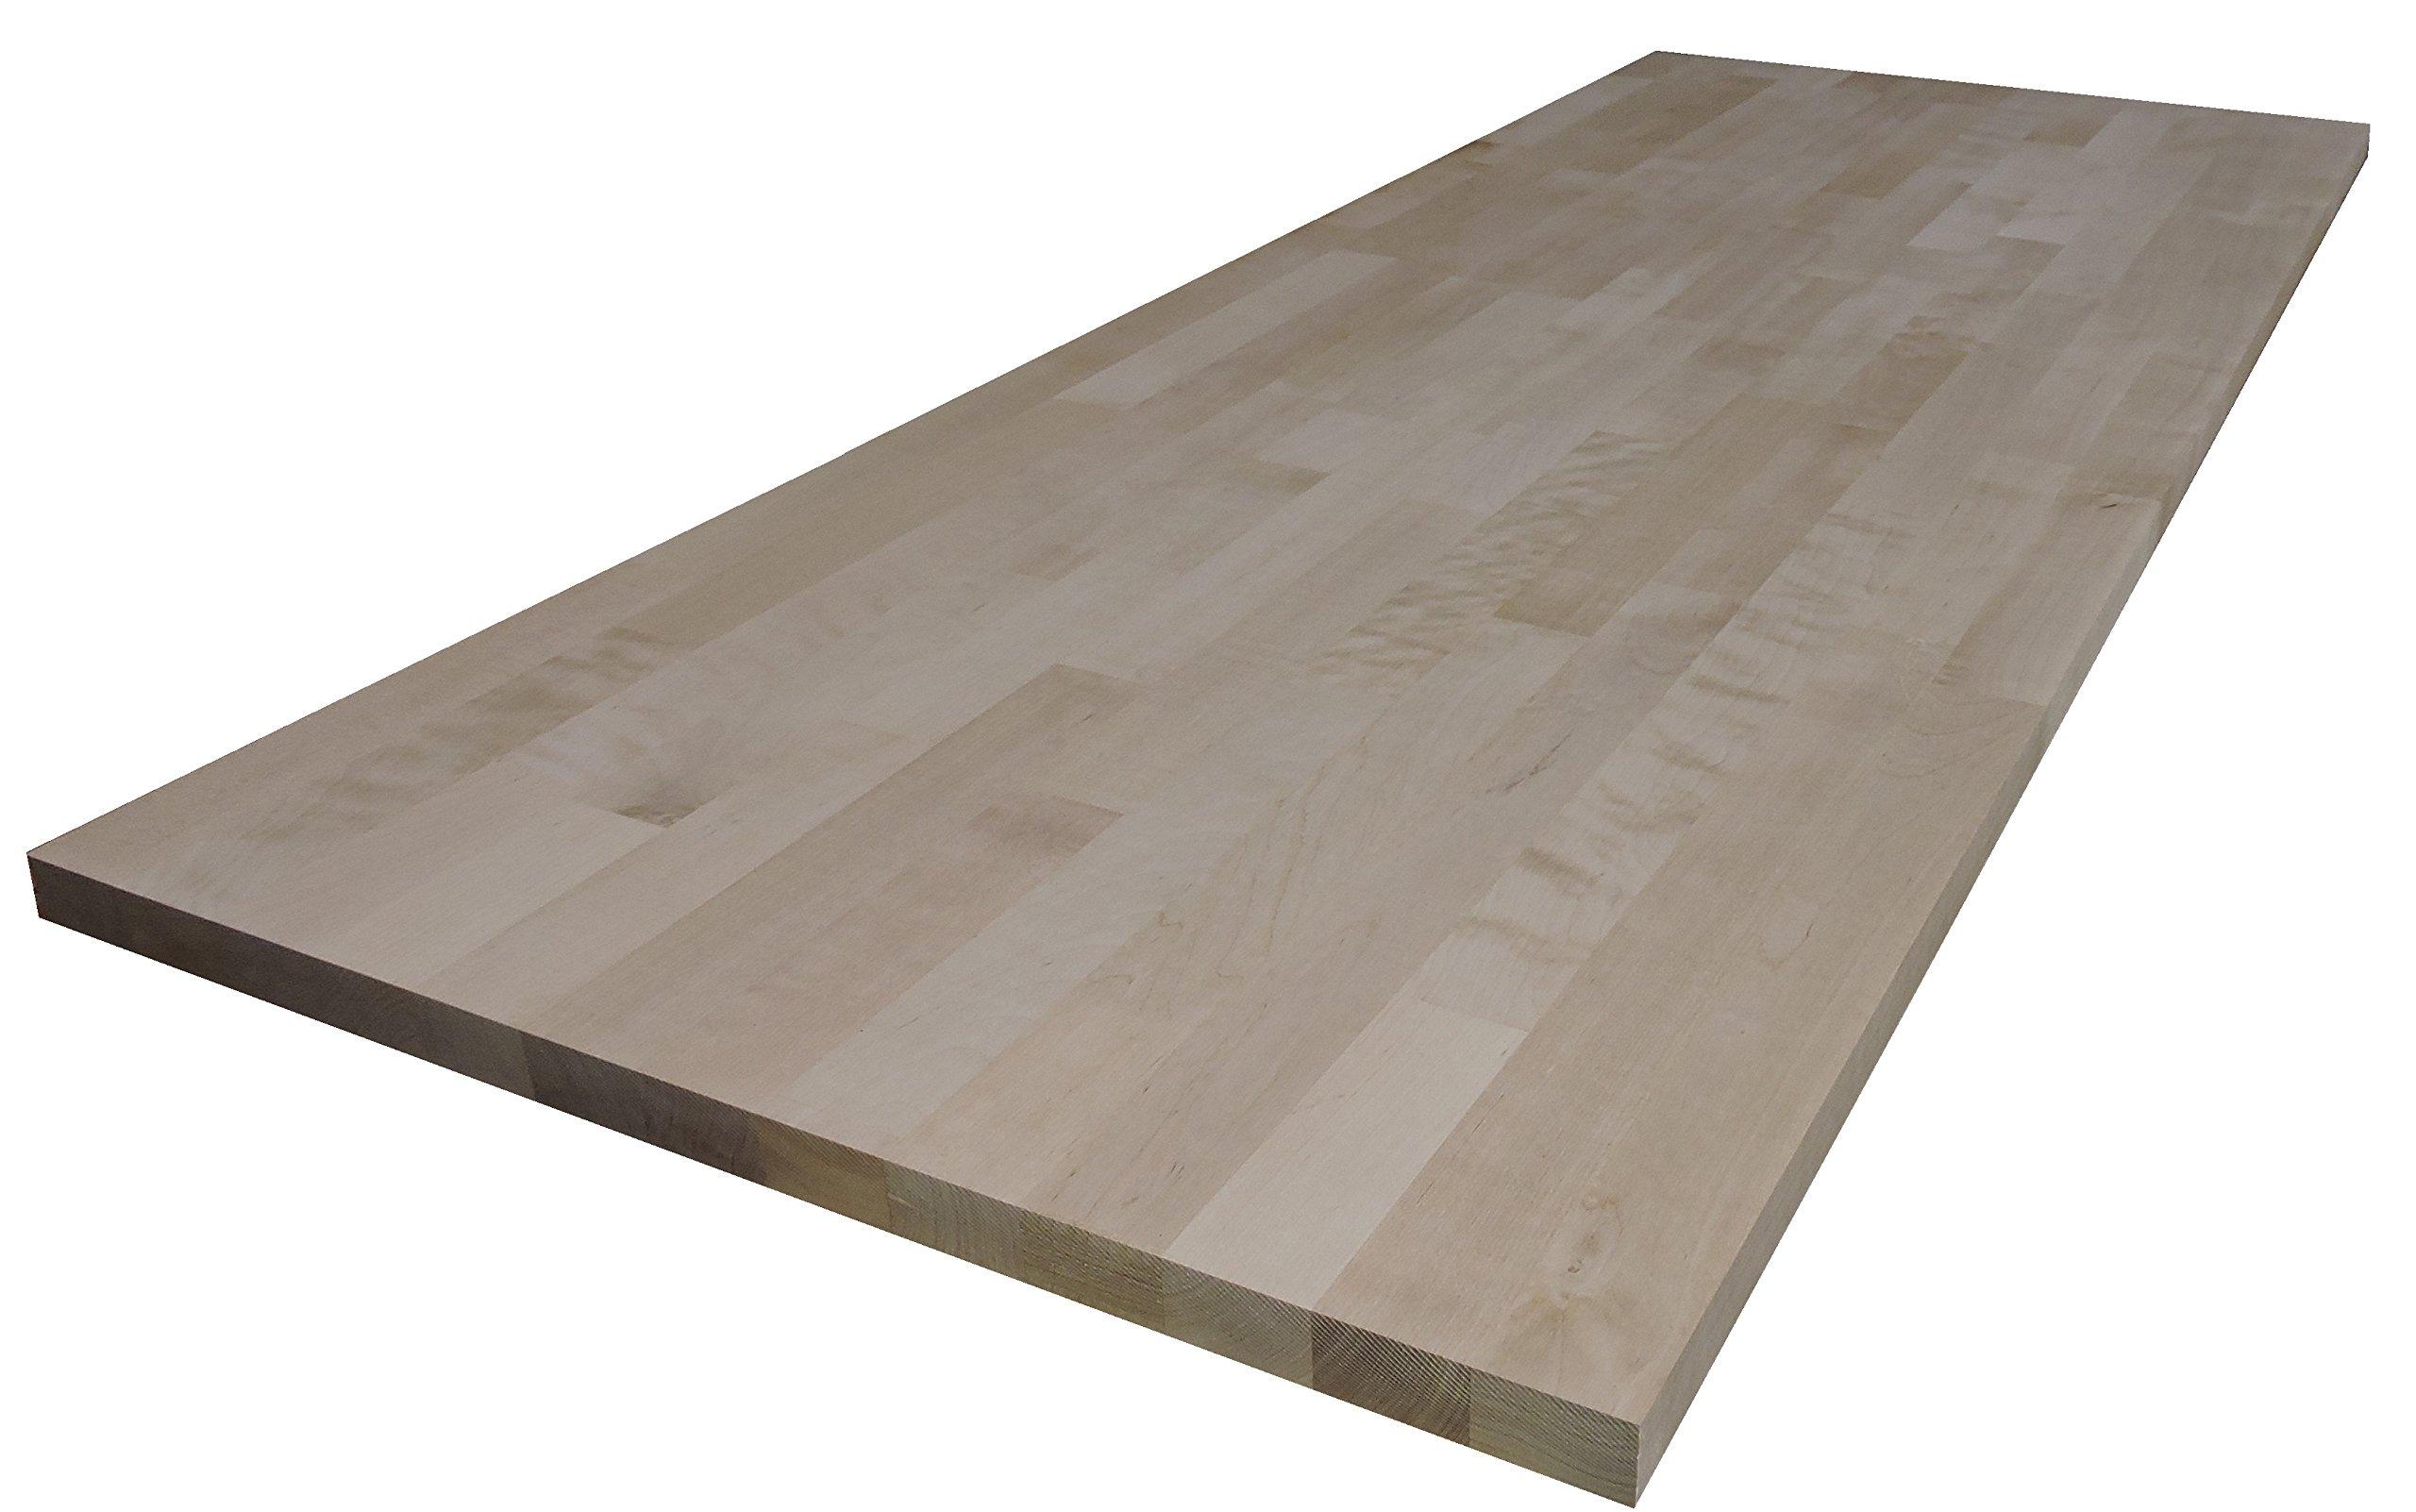 Allwood 5/4 (1.25'') x 12'' x 29'' Birch Table/Counter/Island Top see all edge options (Sharp edges)